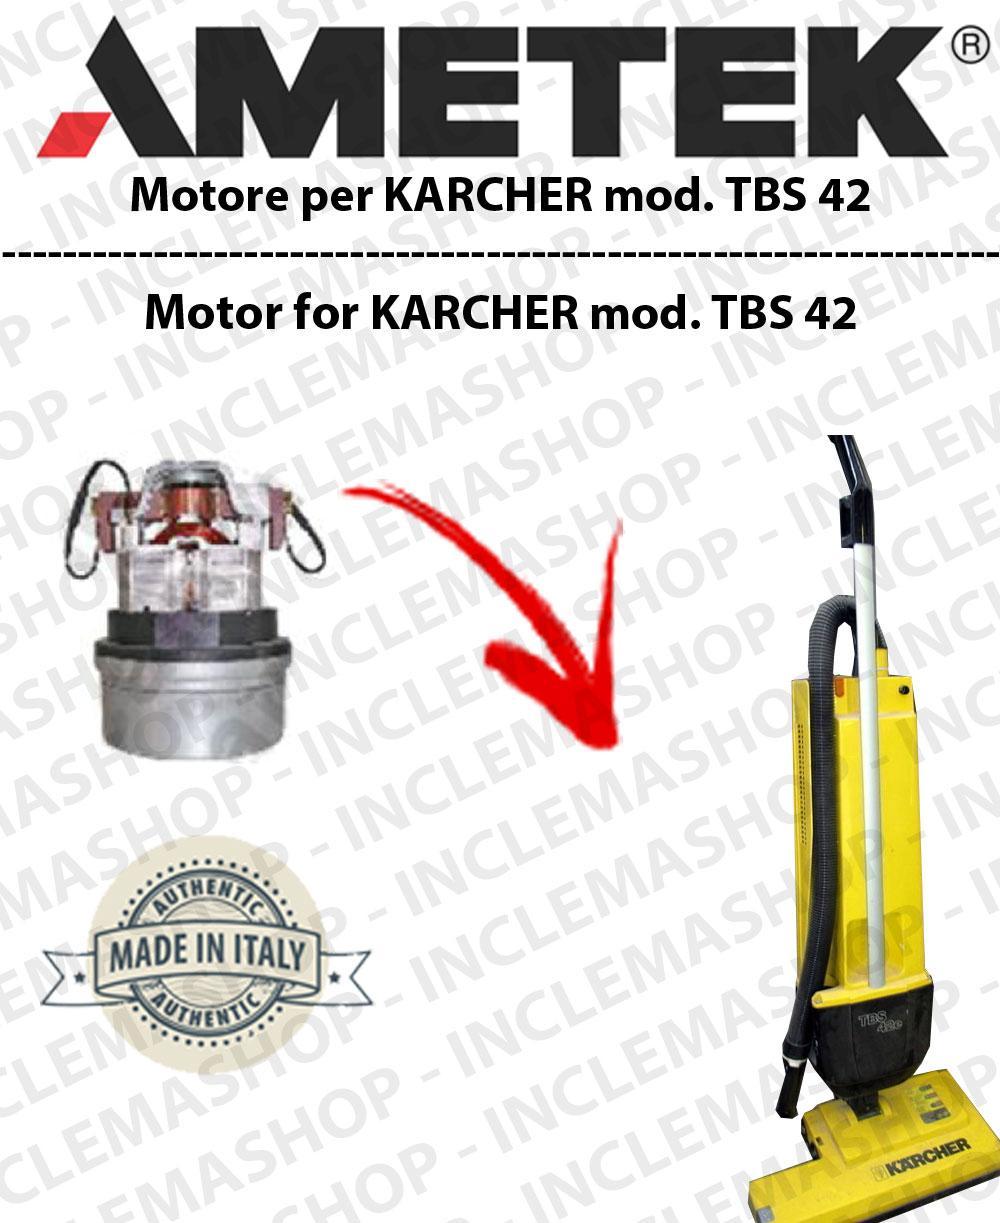 f84bb6e5ca9d27 TBS 42 moteur AMETEK di aspirazione pour shampouineuse KARCHER